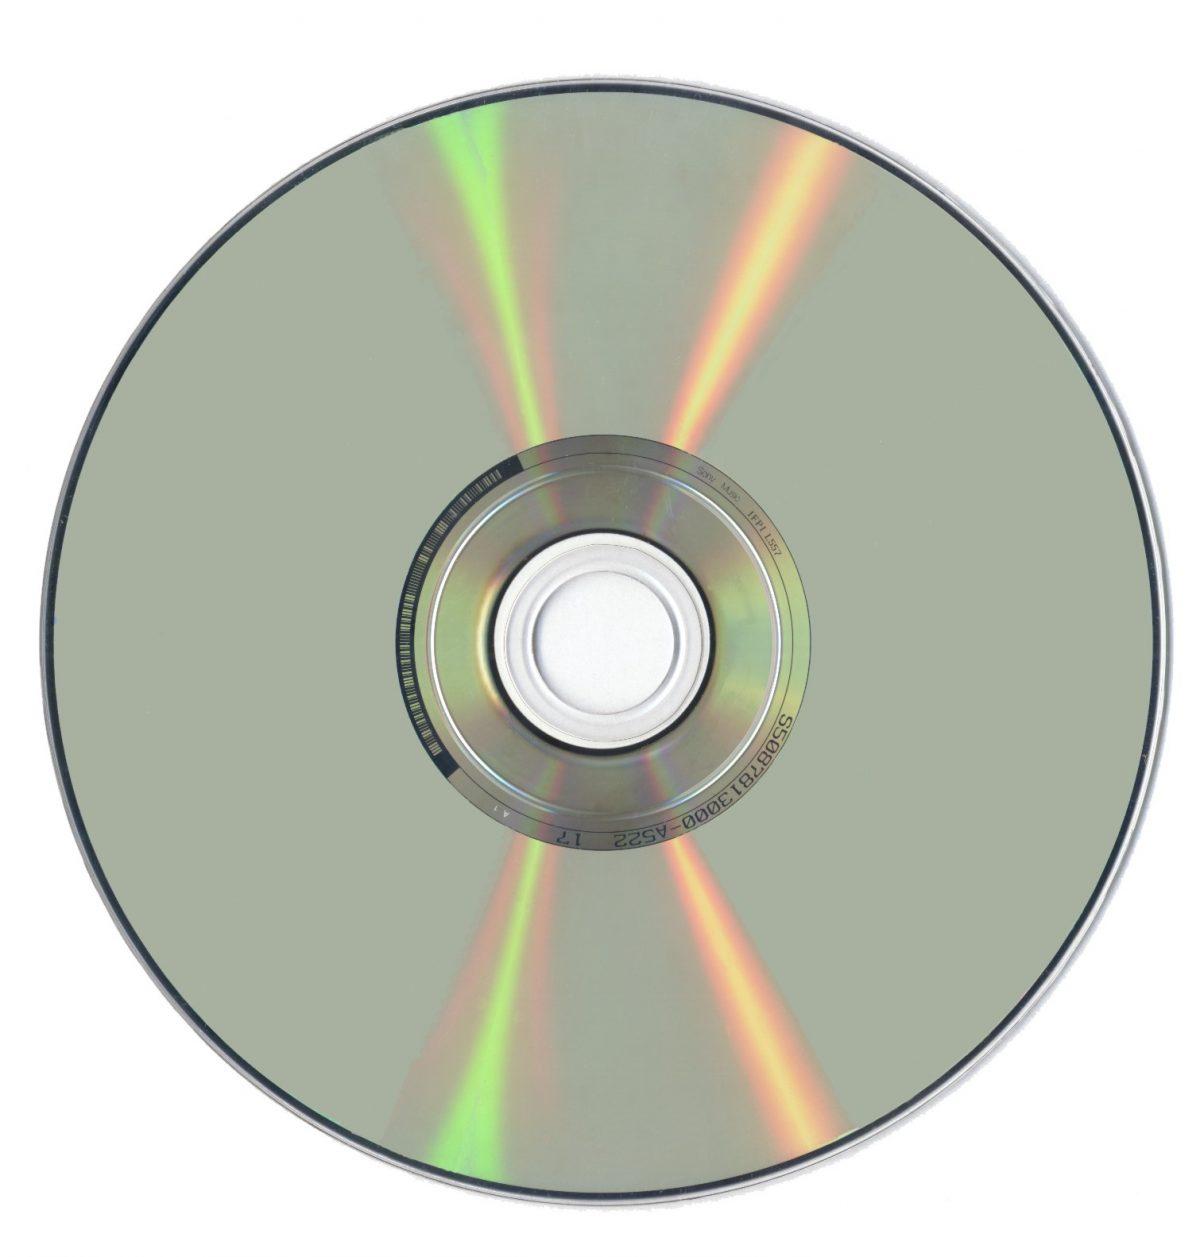 DVD-Video_bottom-side-1200x1257.jpg